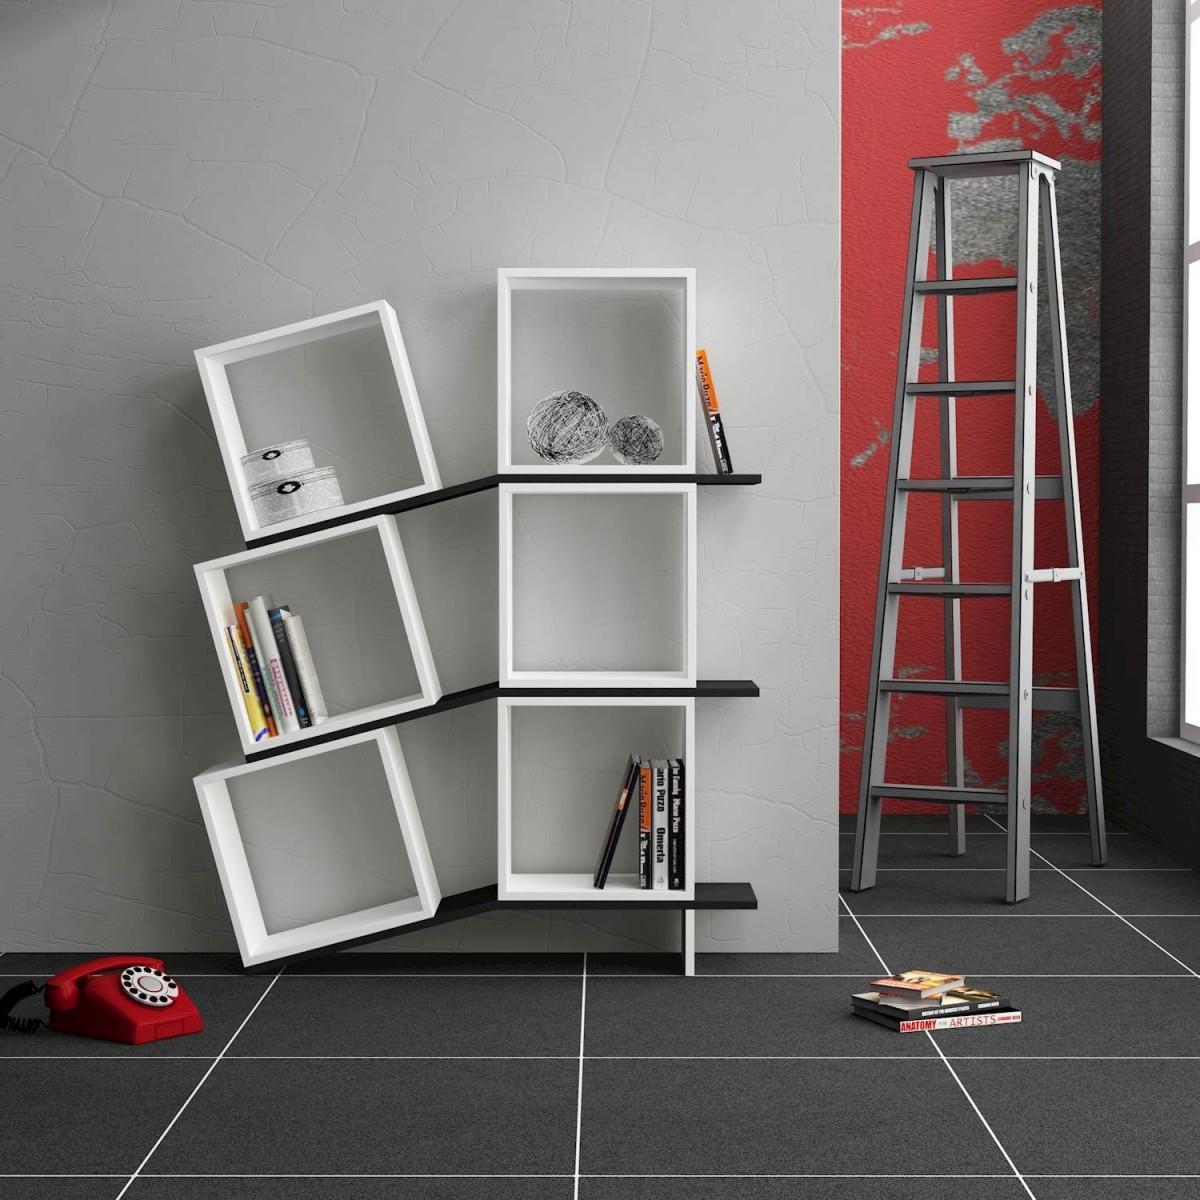 Sloping libreria da parete cubi e mensole in legno bianco for Cubi mensole